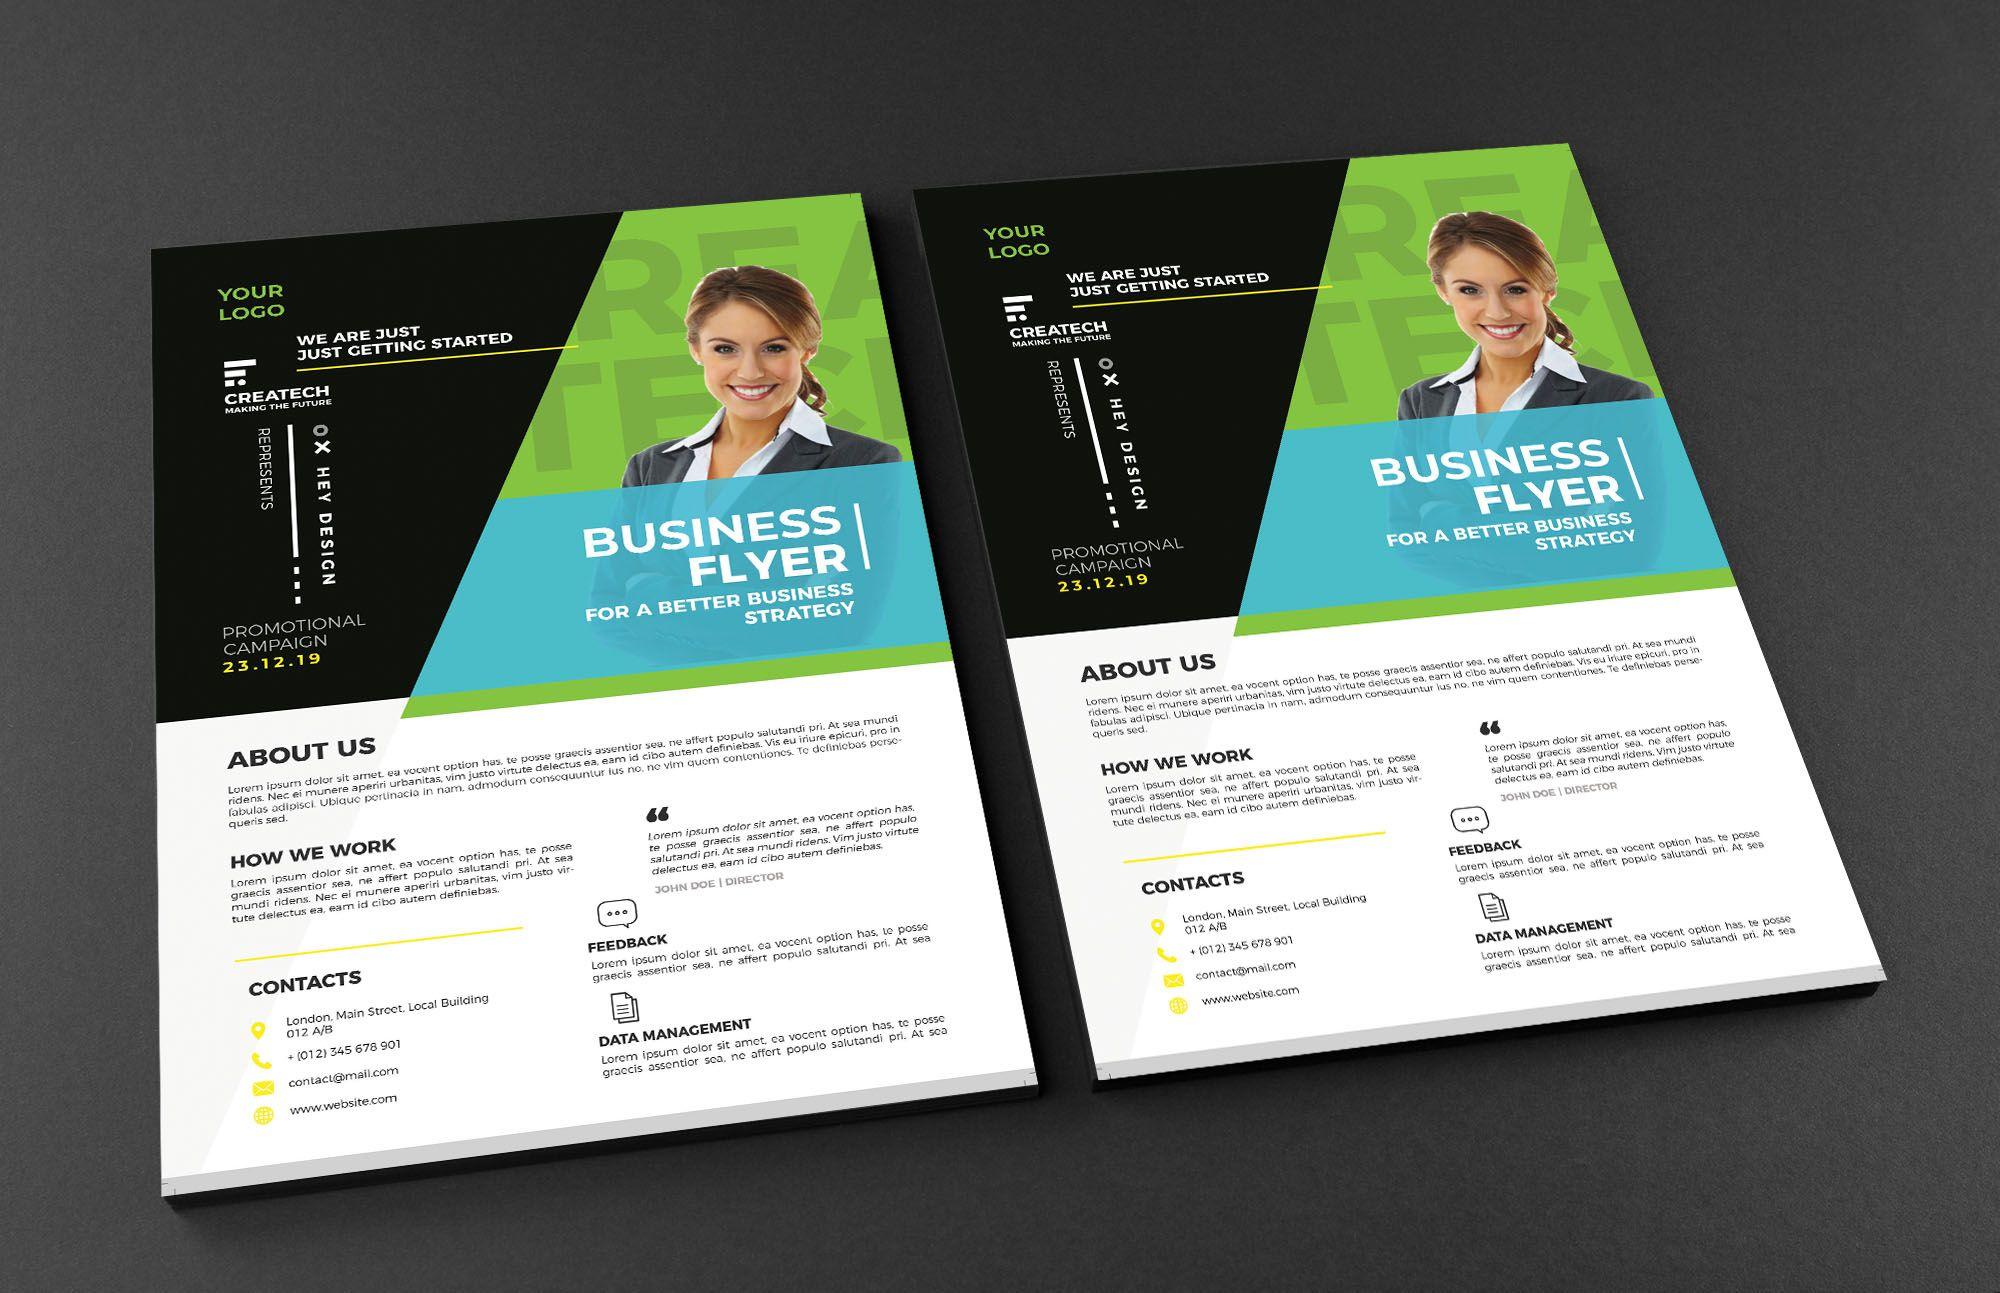 Pushpo Pro I Will Do Professional Business Flyers Design 12 Hours For 5 On Fiverr Com Business Flyer Flyer Design Flyer